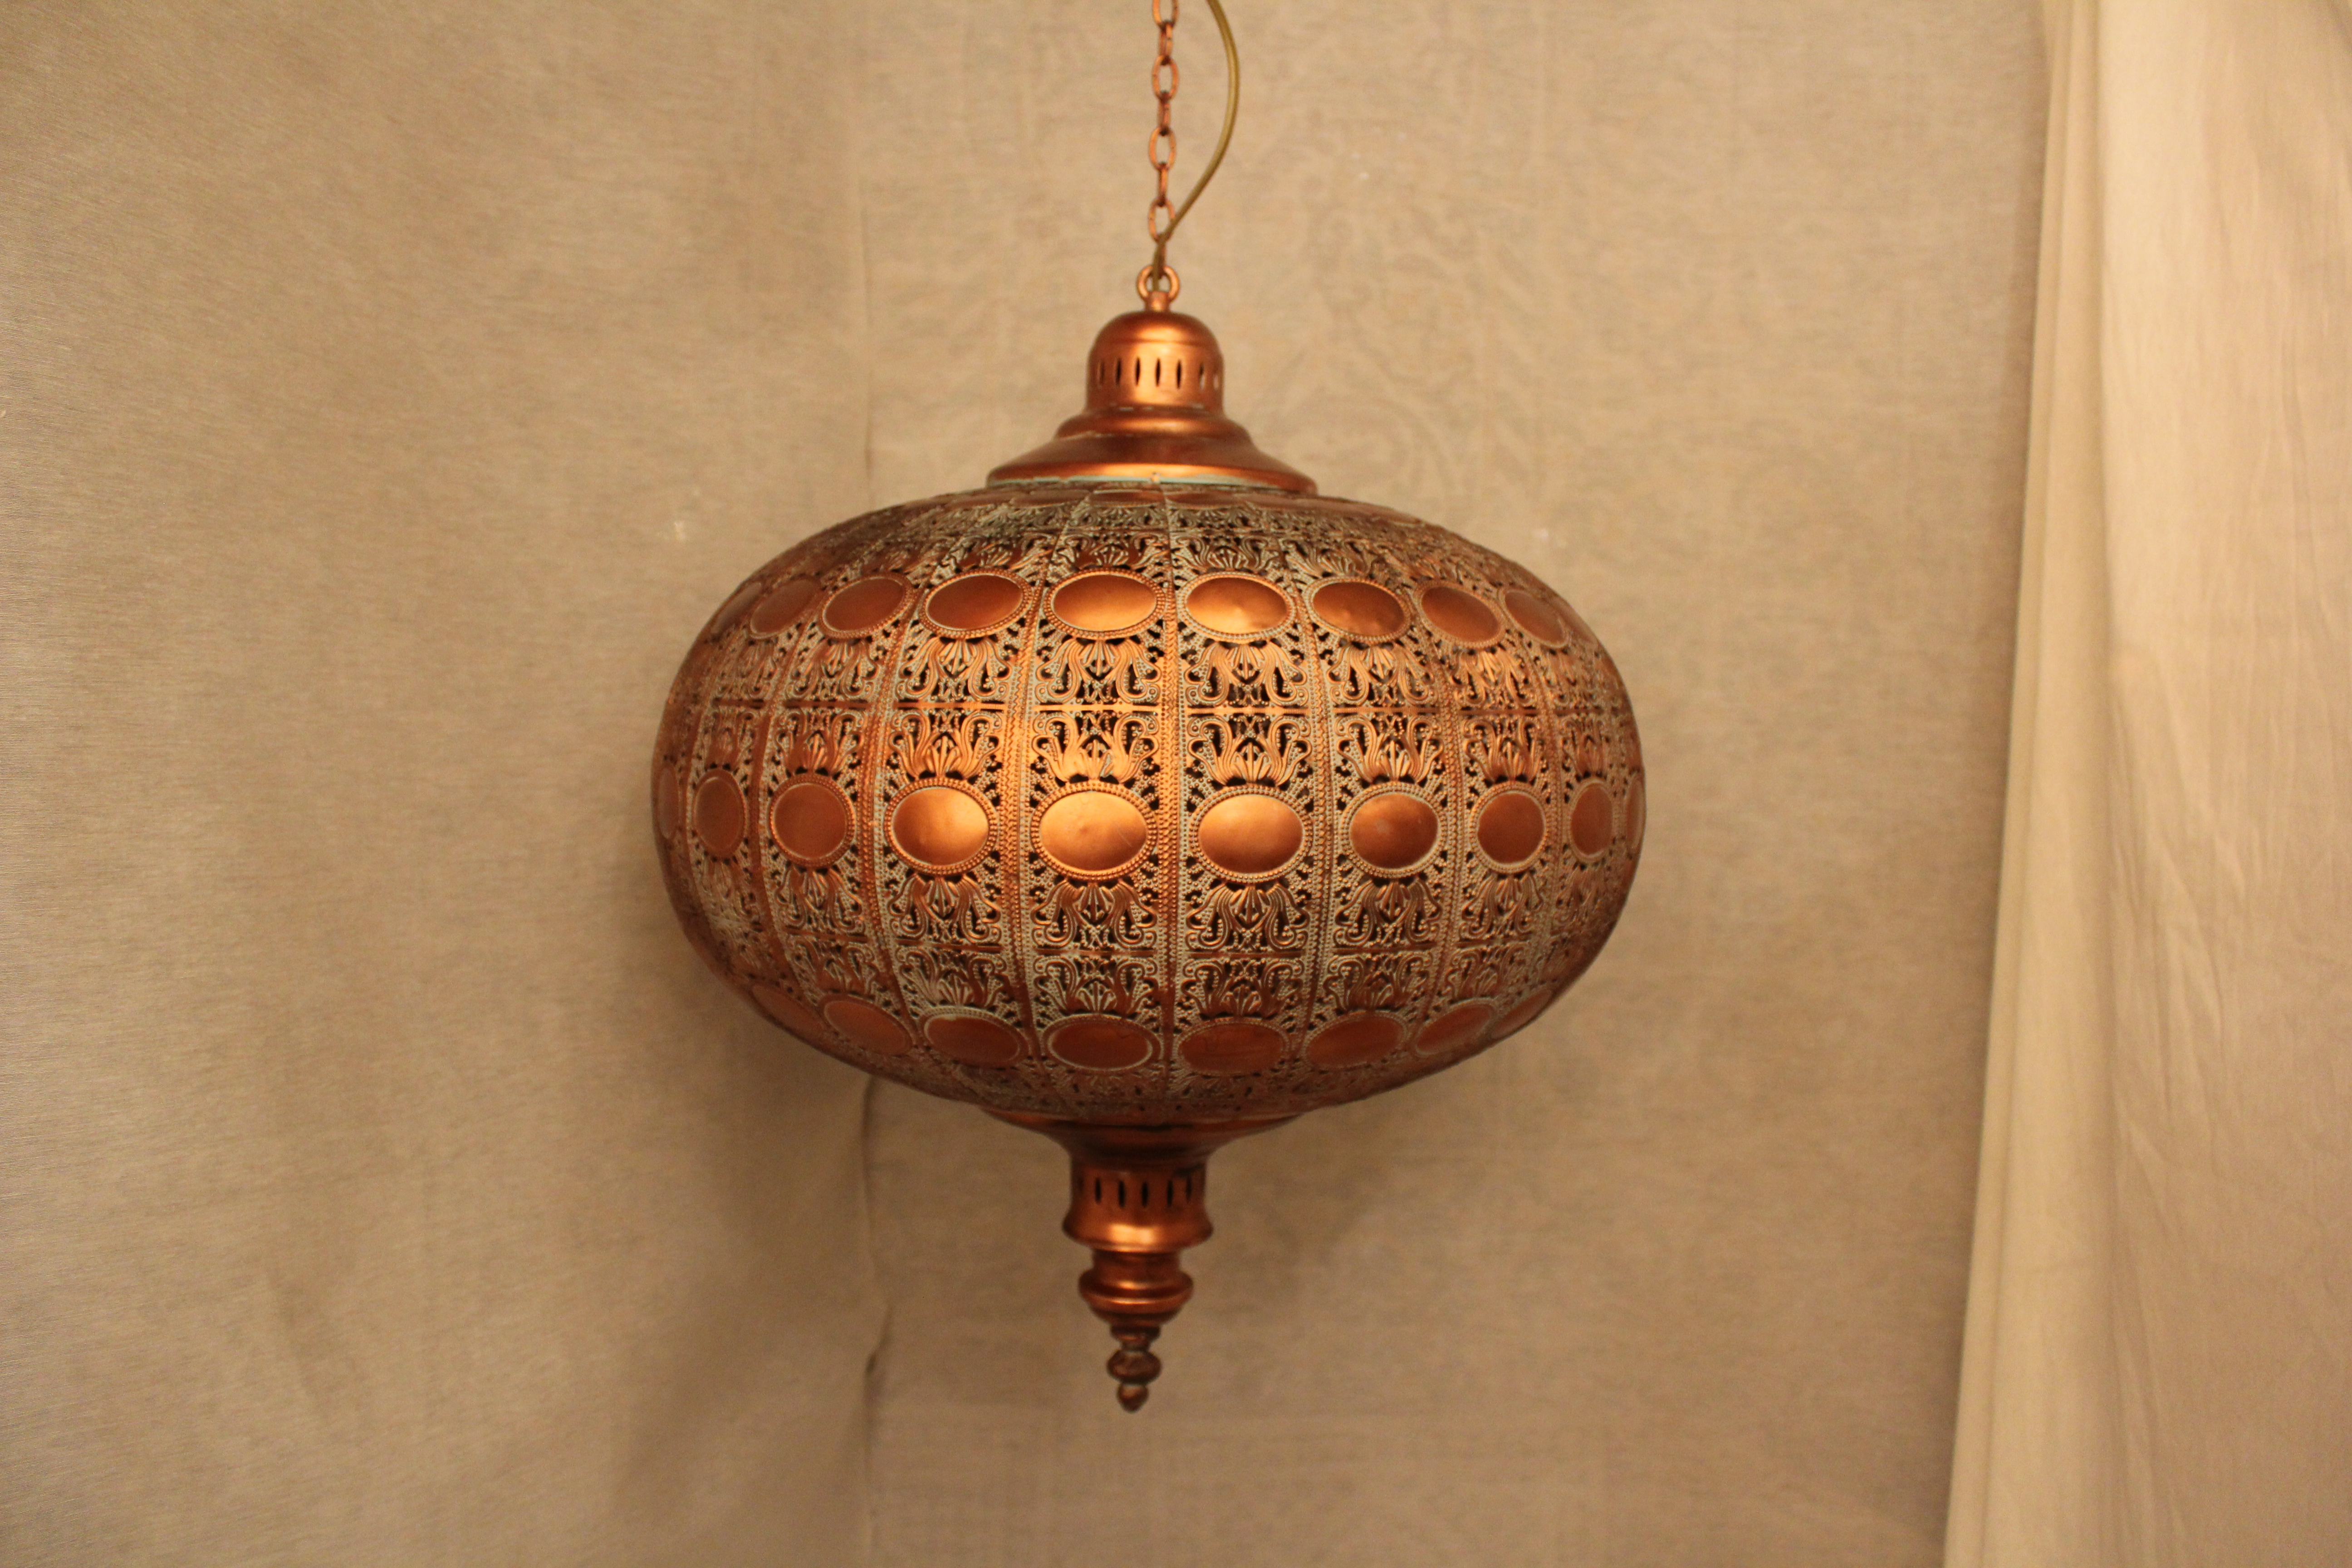 keukentegels groot : Indiase Hanglamp Koper Groot Gomsa Webshop